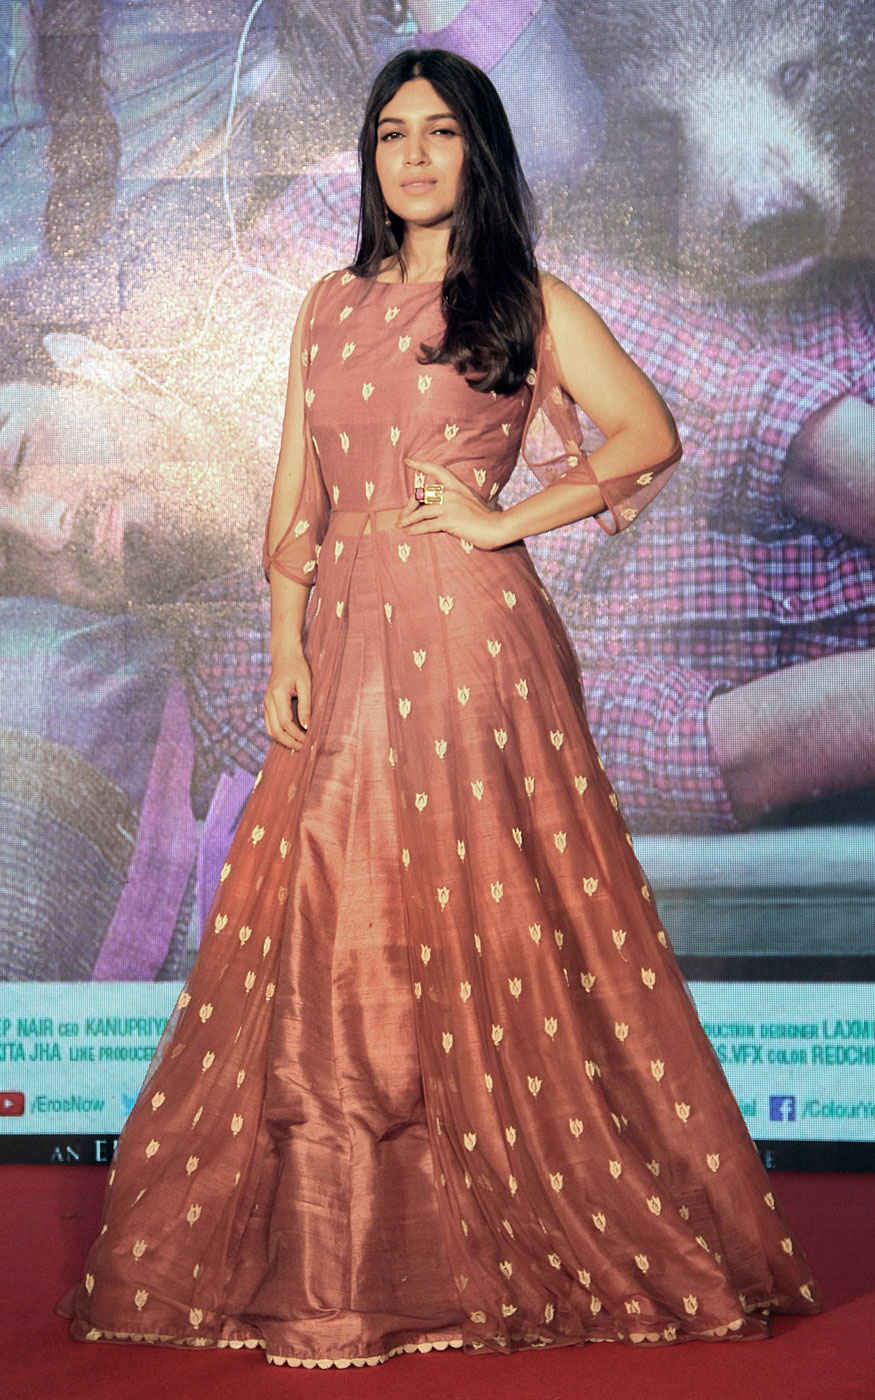 Ayushmann Khurrana and Bhumi Pednekar at Trailer Launch of 'Shubh Mangal Savdhan'